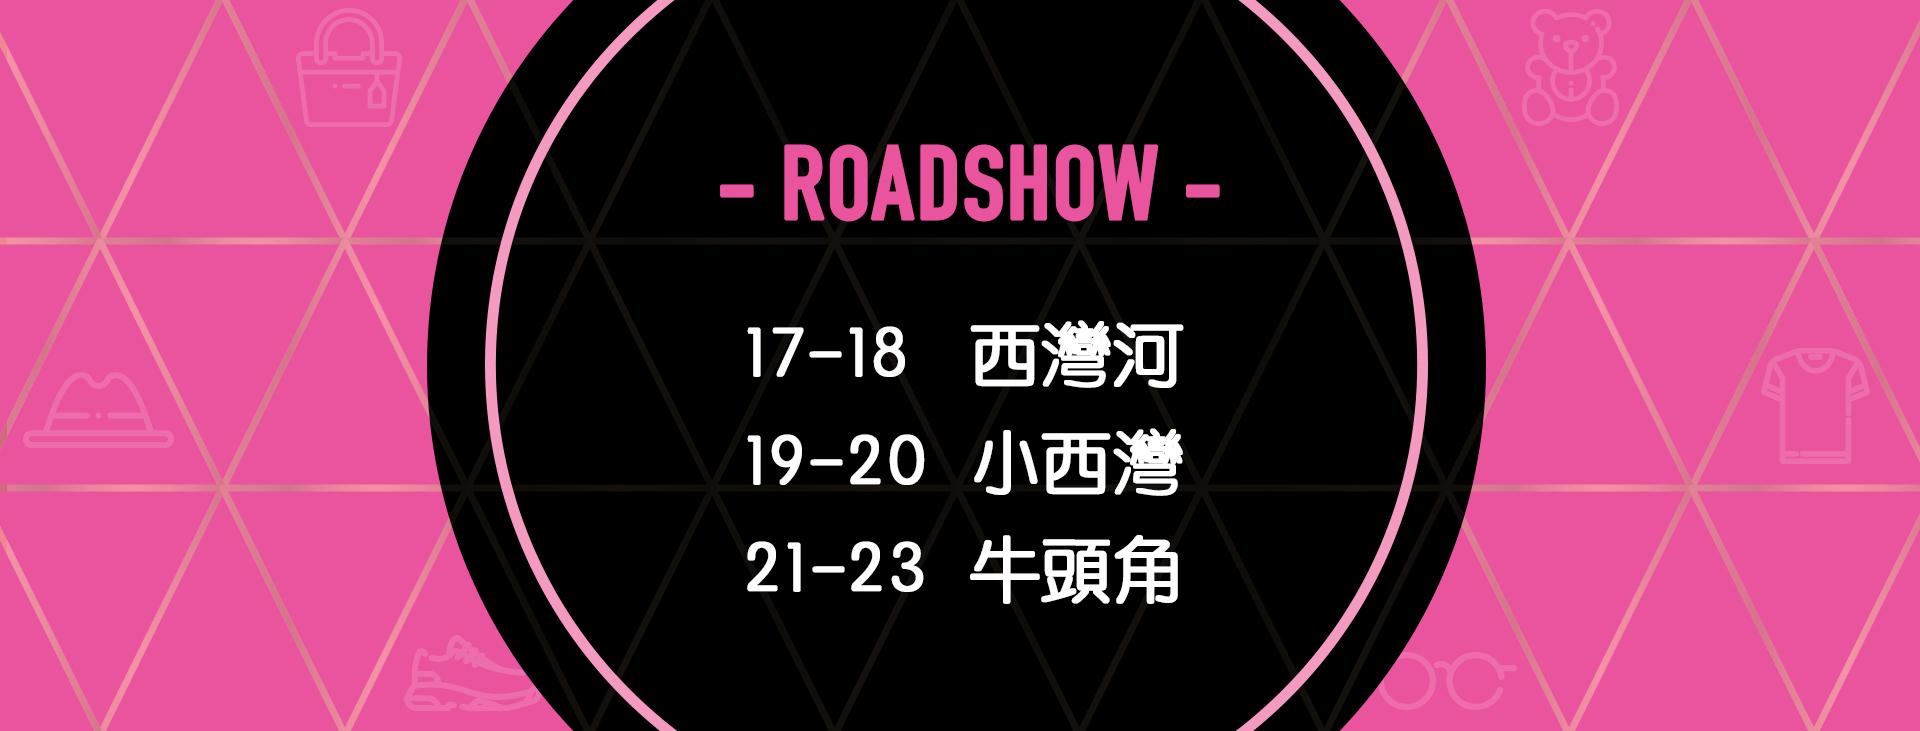 Atomland Roadshow 日程 (17-23)